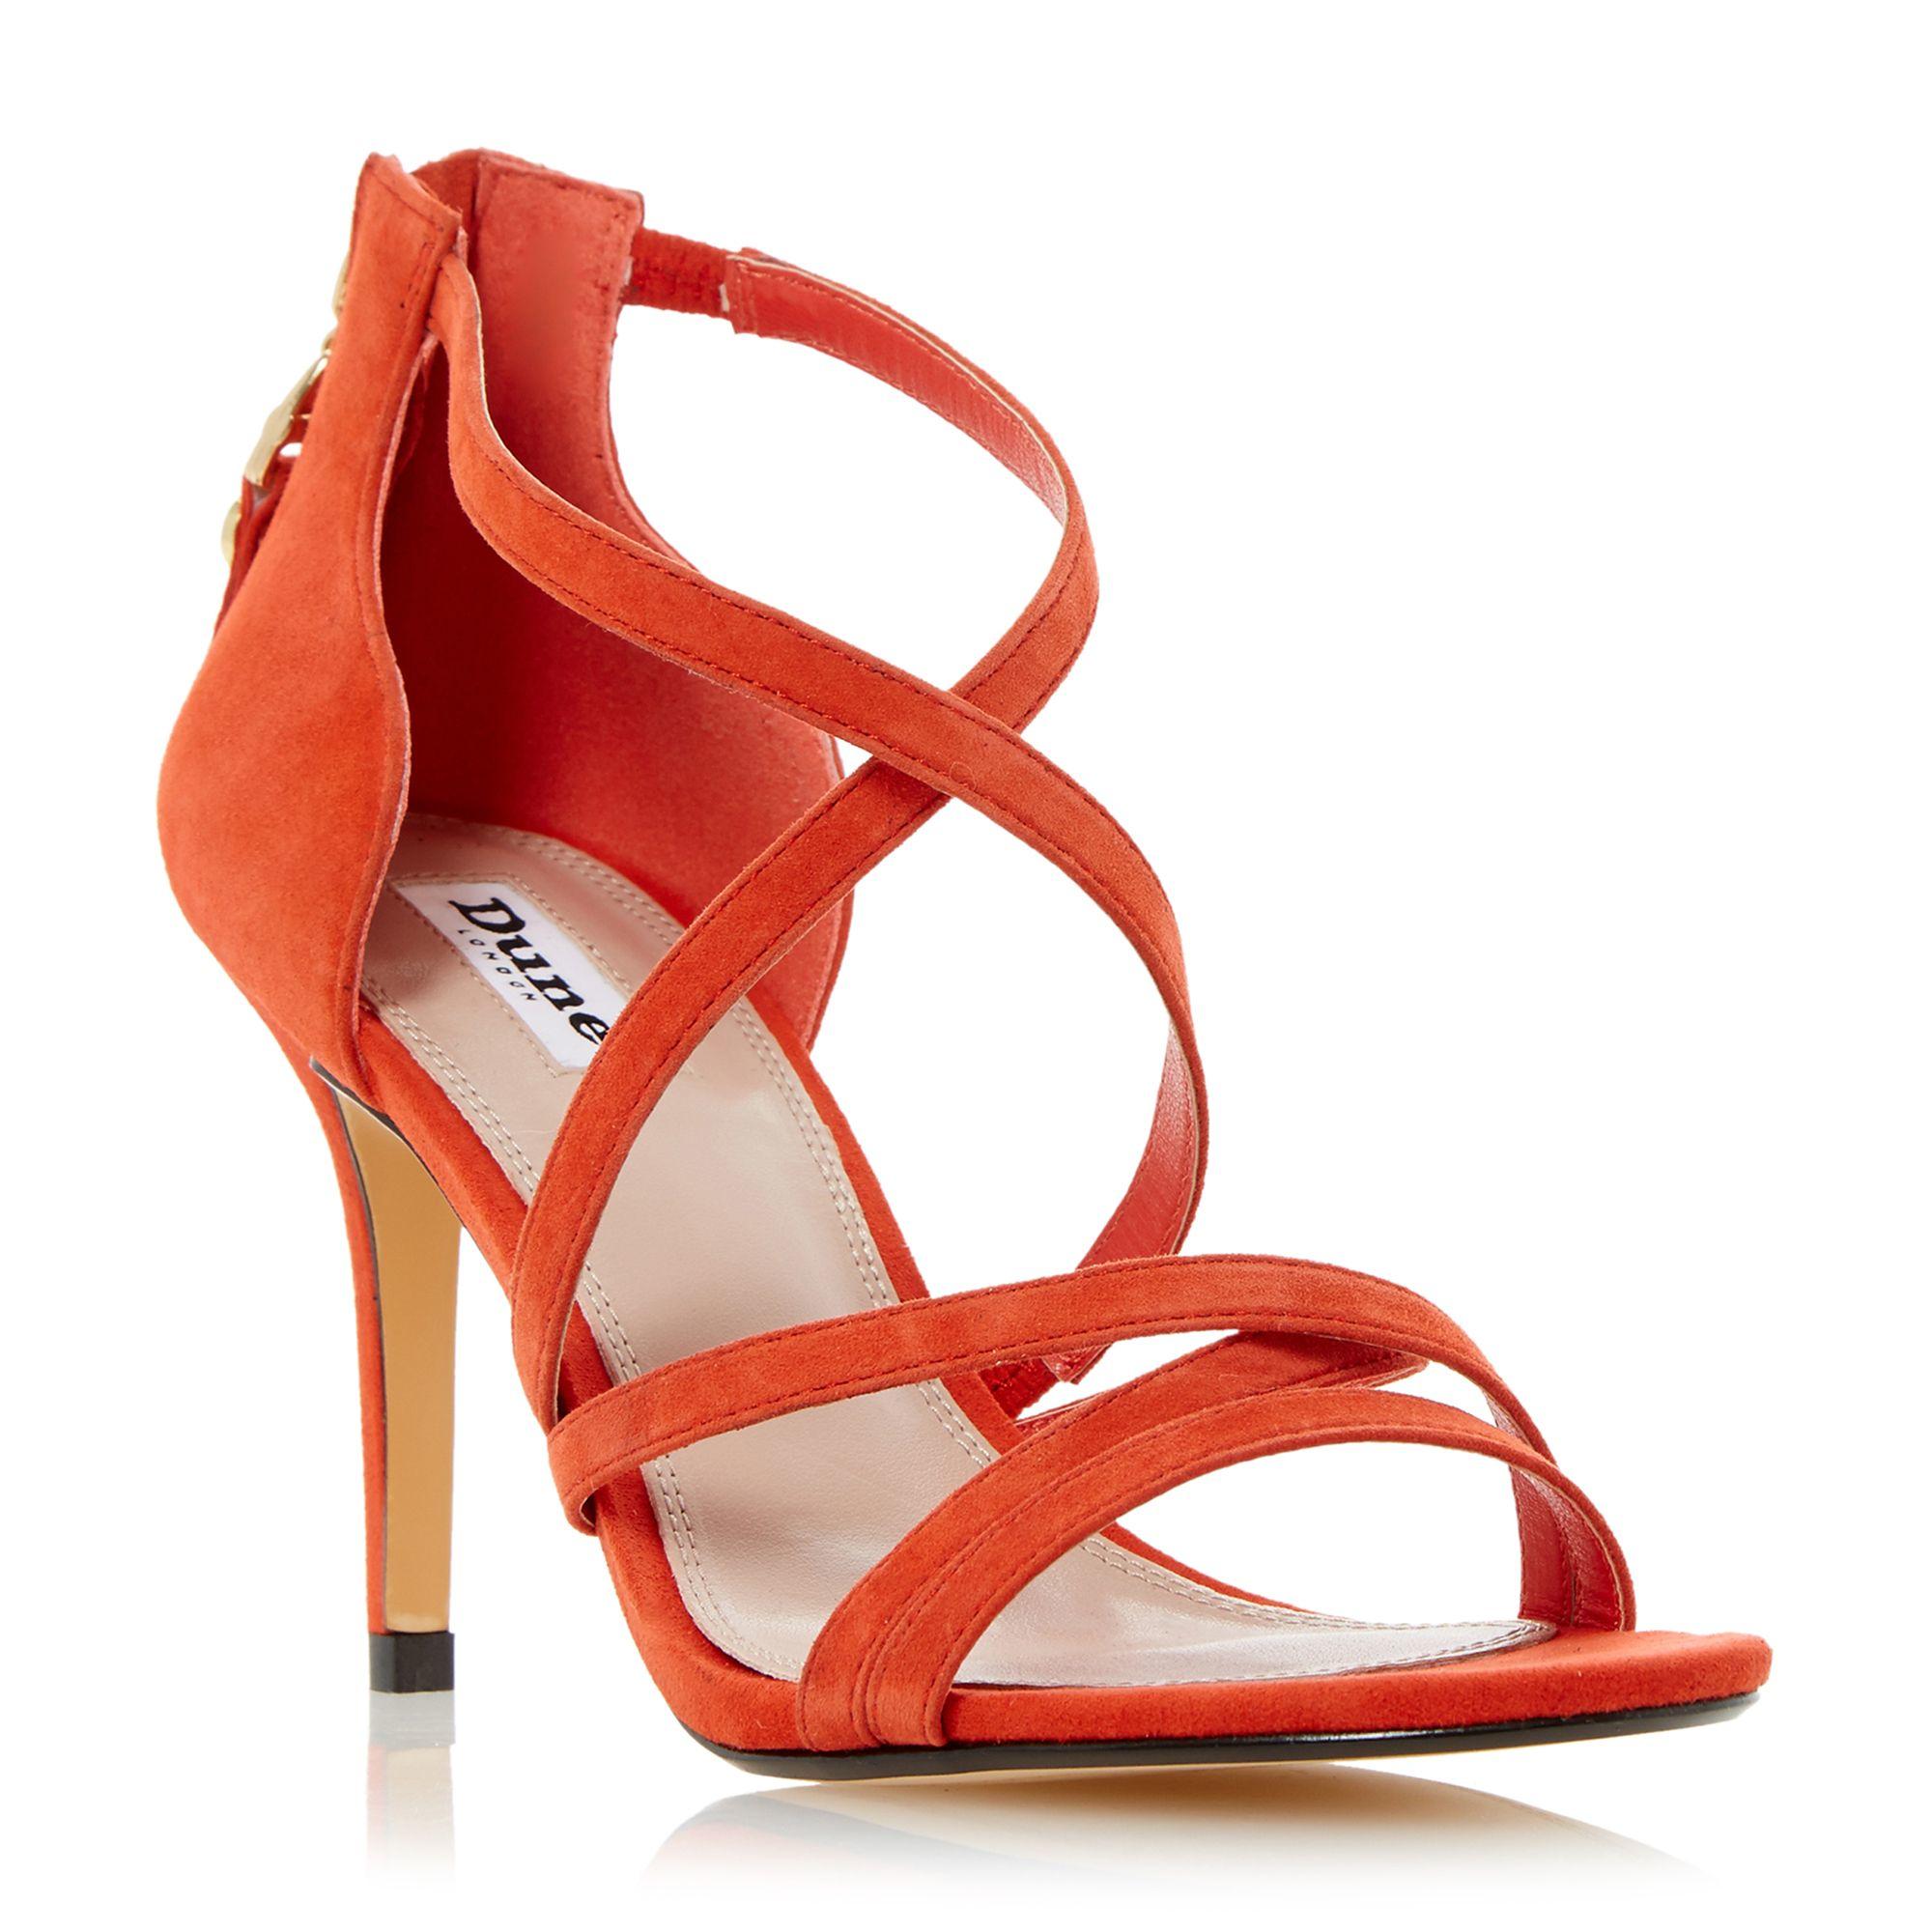 Bright Orange Two Part Strappy Heeled Sandal - Orange patent Dune London h7wGtRTVHE